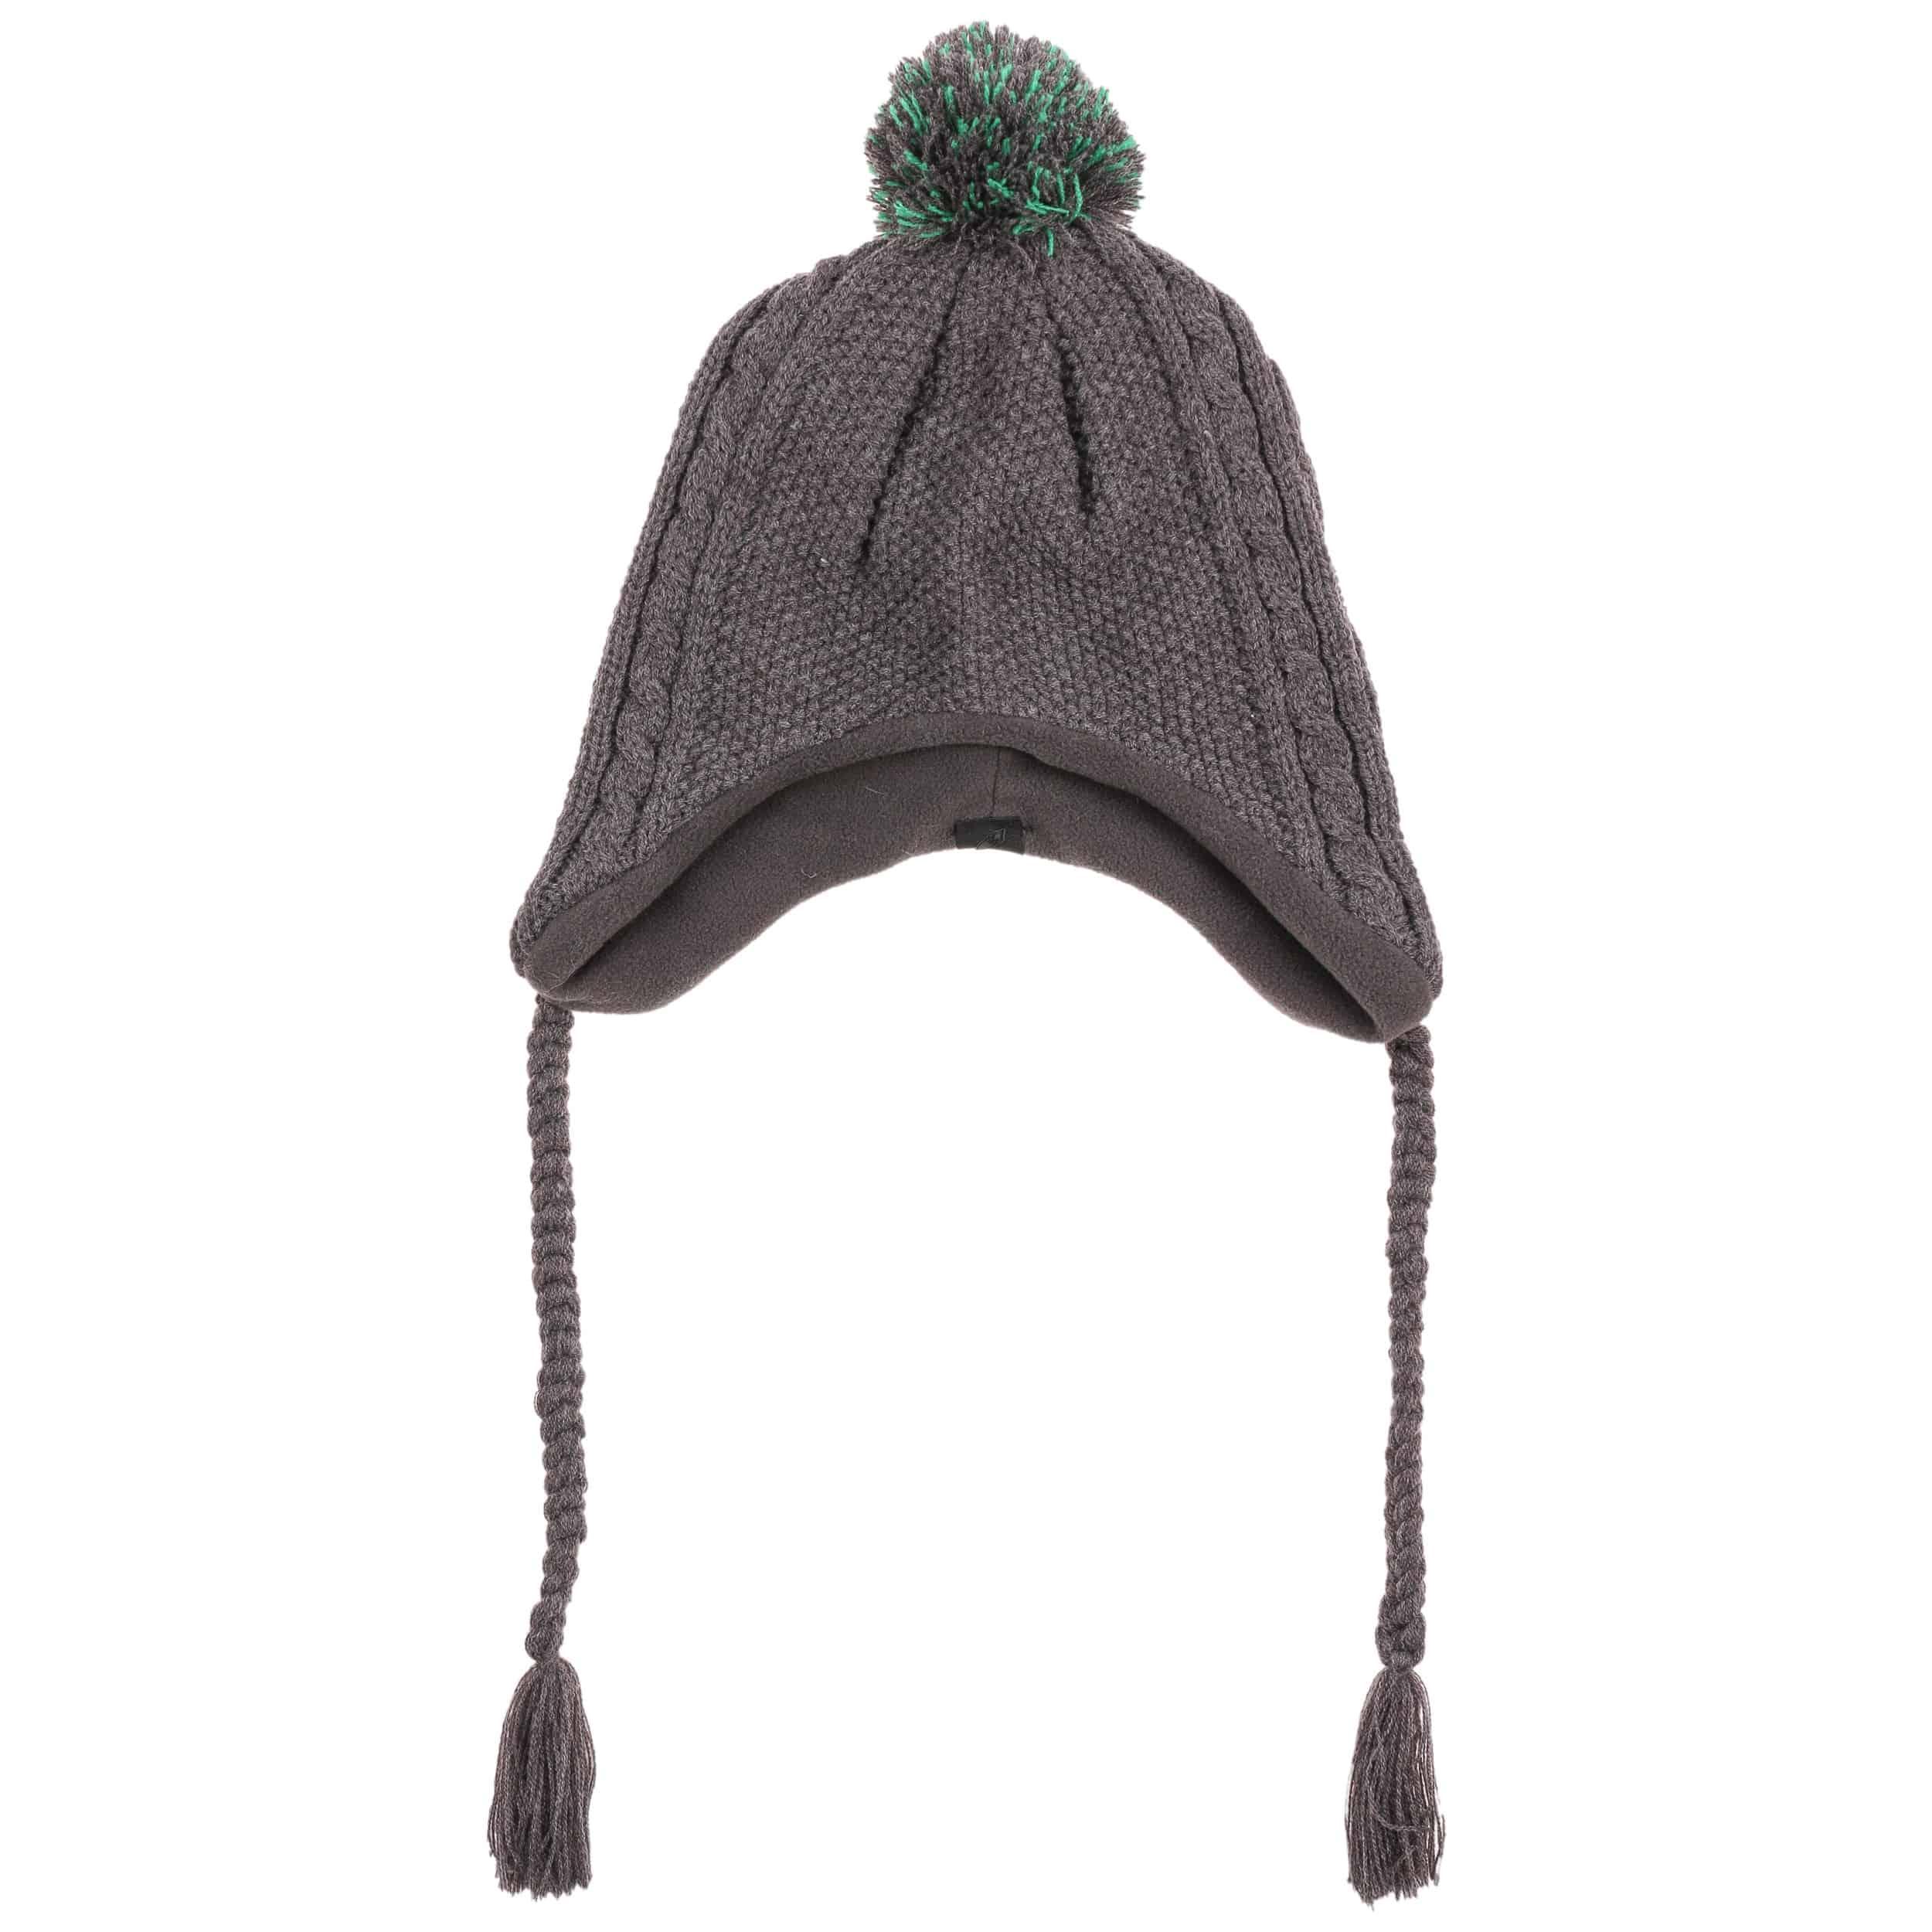 cb8407c84e7 Ritzy Peruvian Hat with Pompom - grey 1 ...